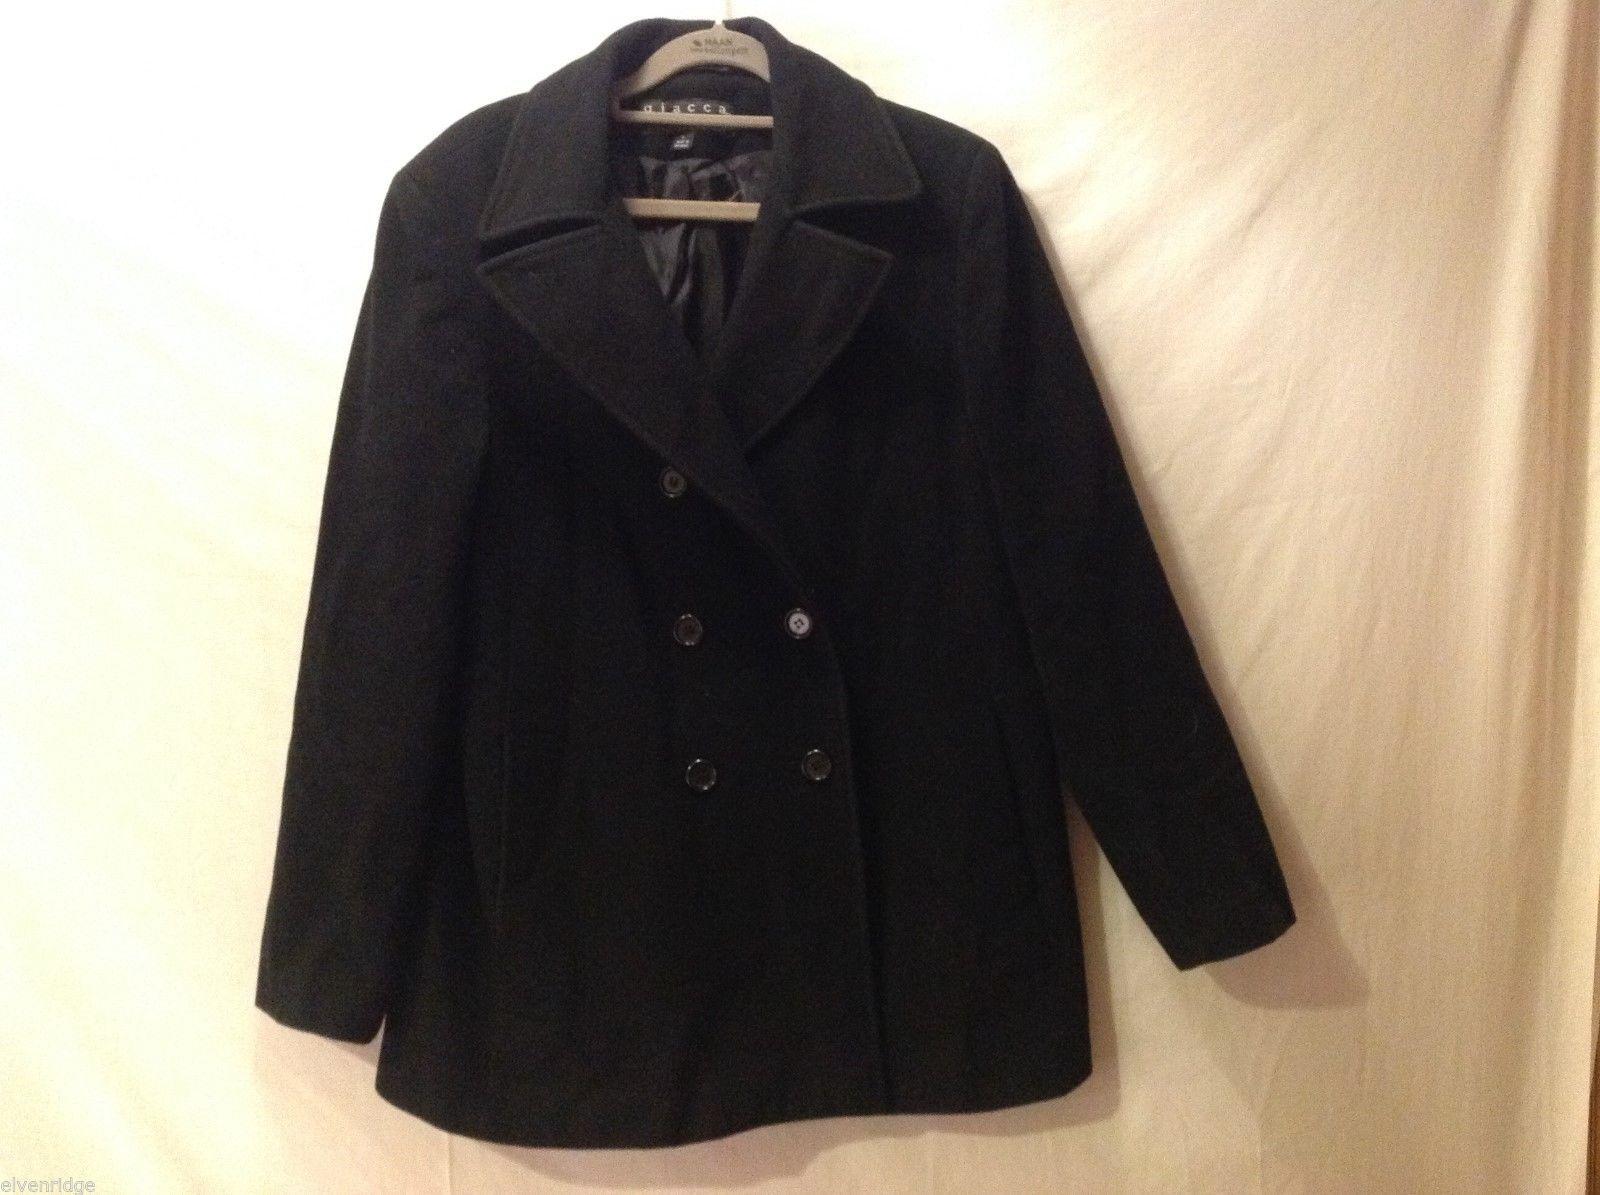 Giacca Women's Black Winter Coat, Size Large